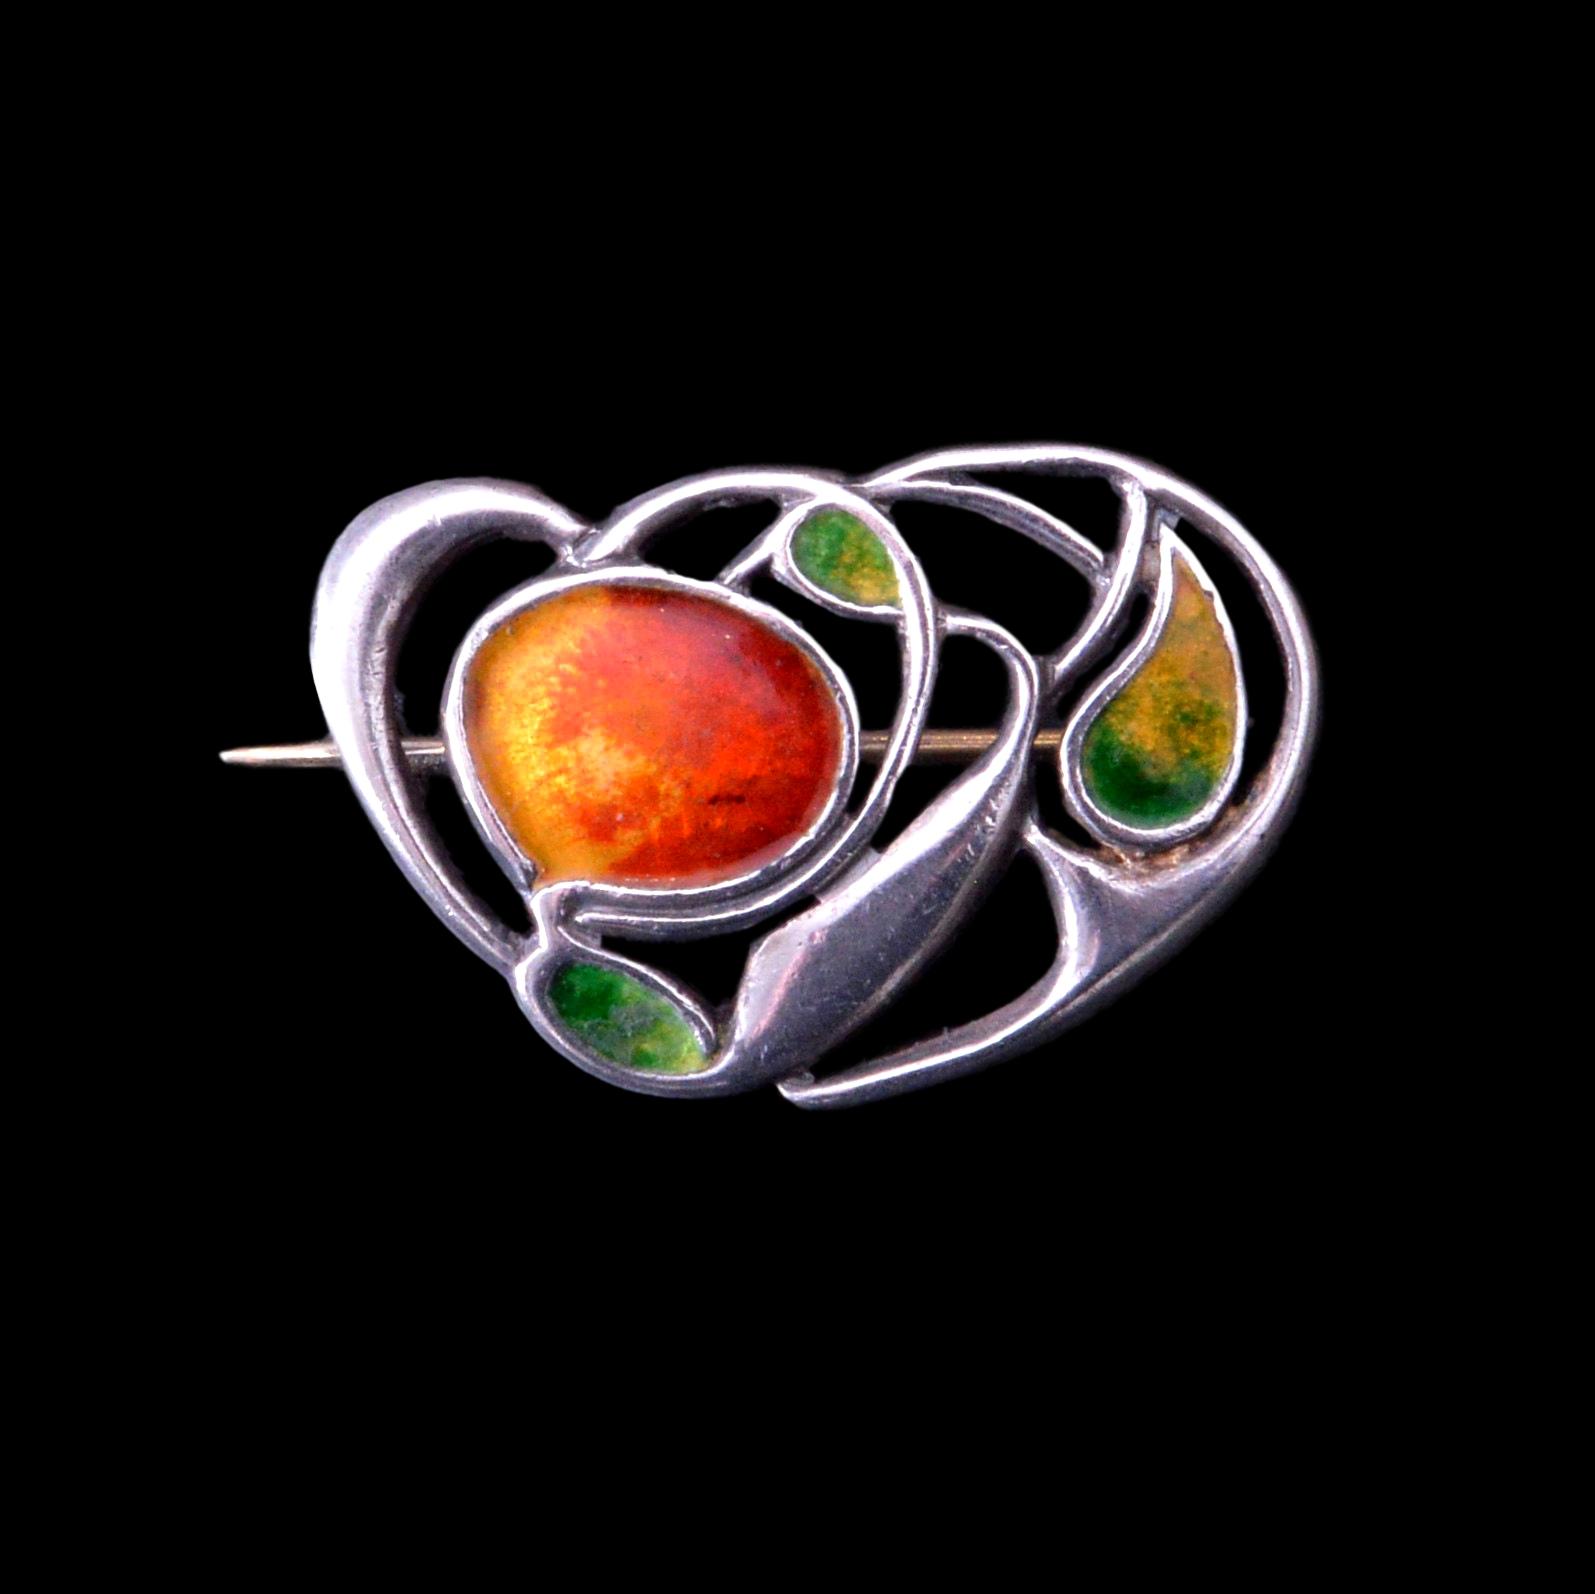 Archibald Knox jewellery